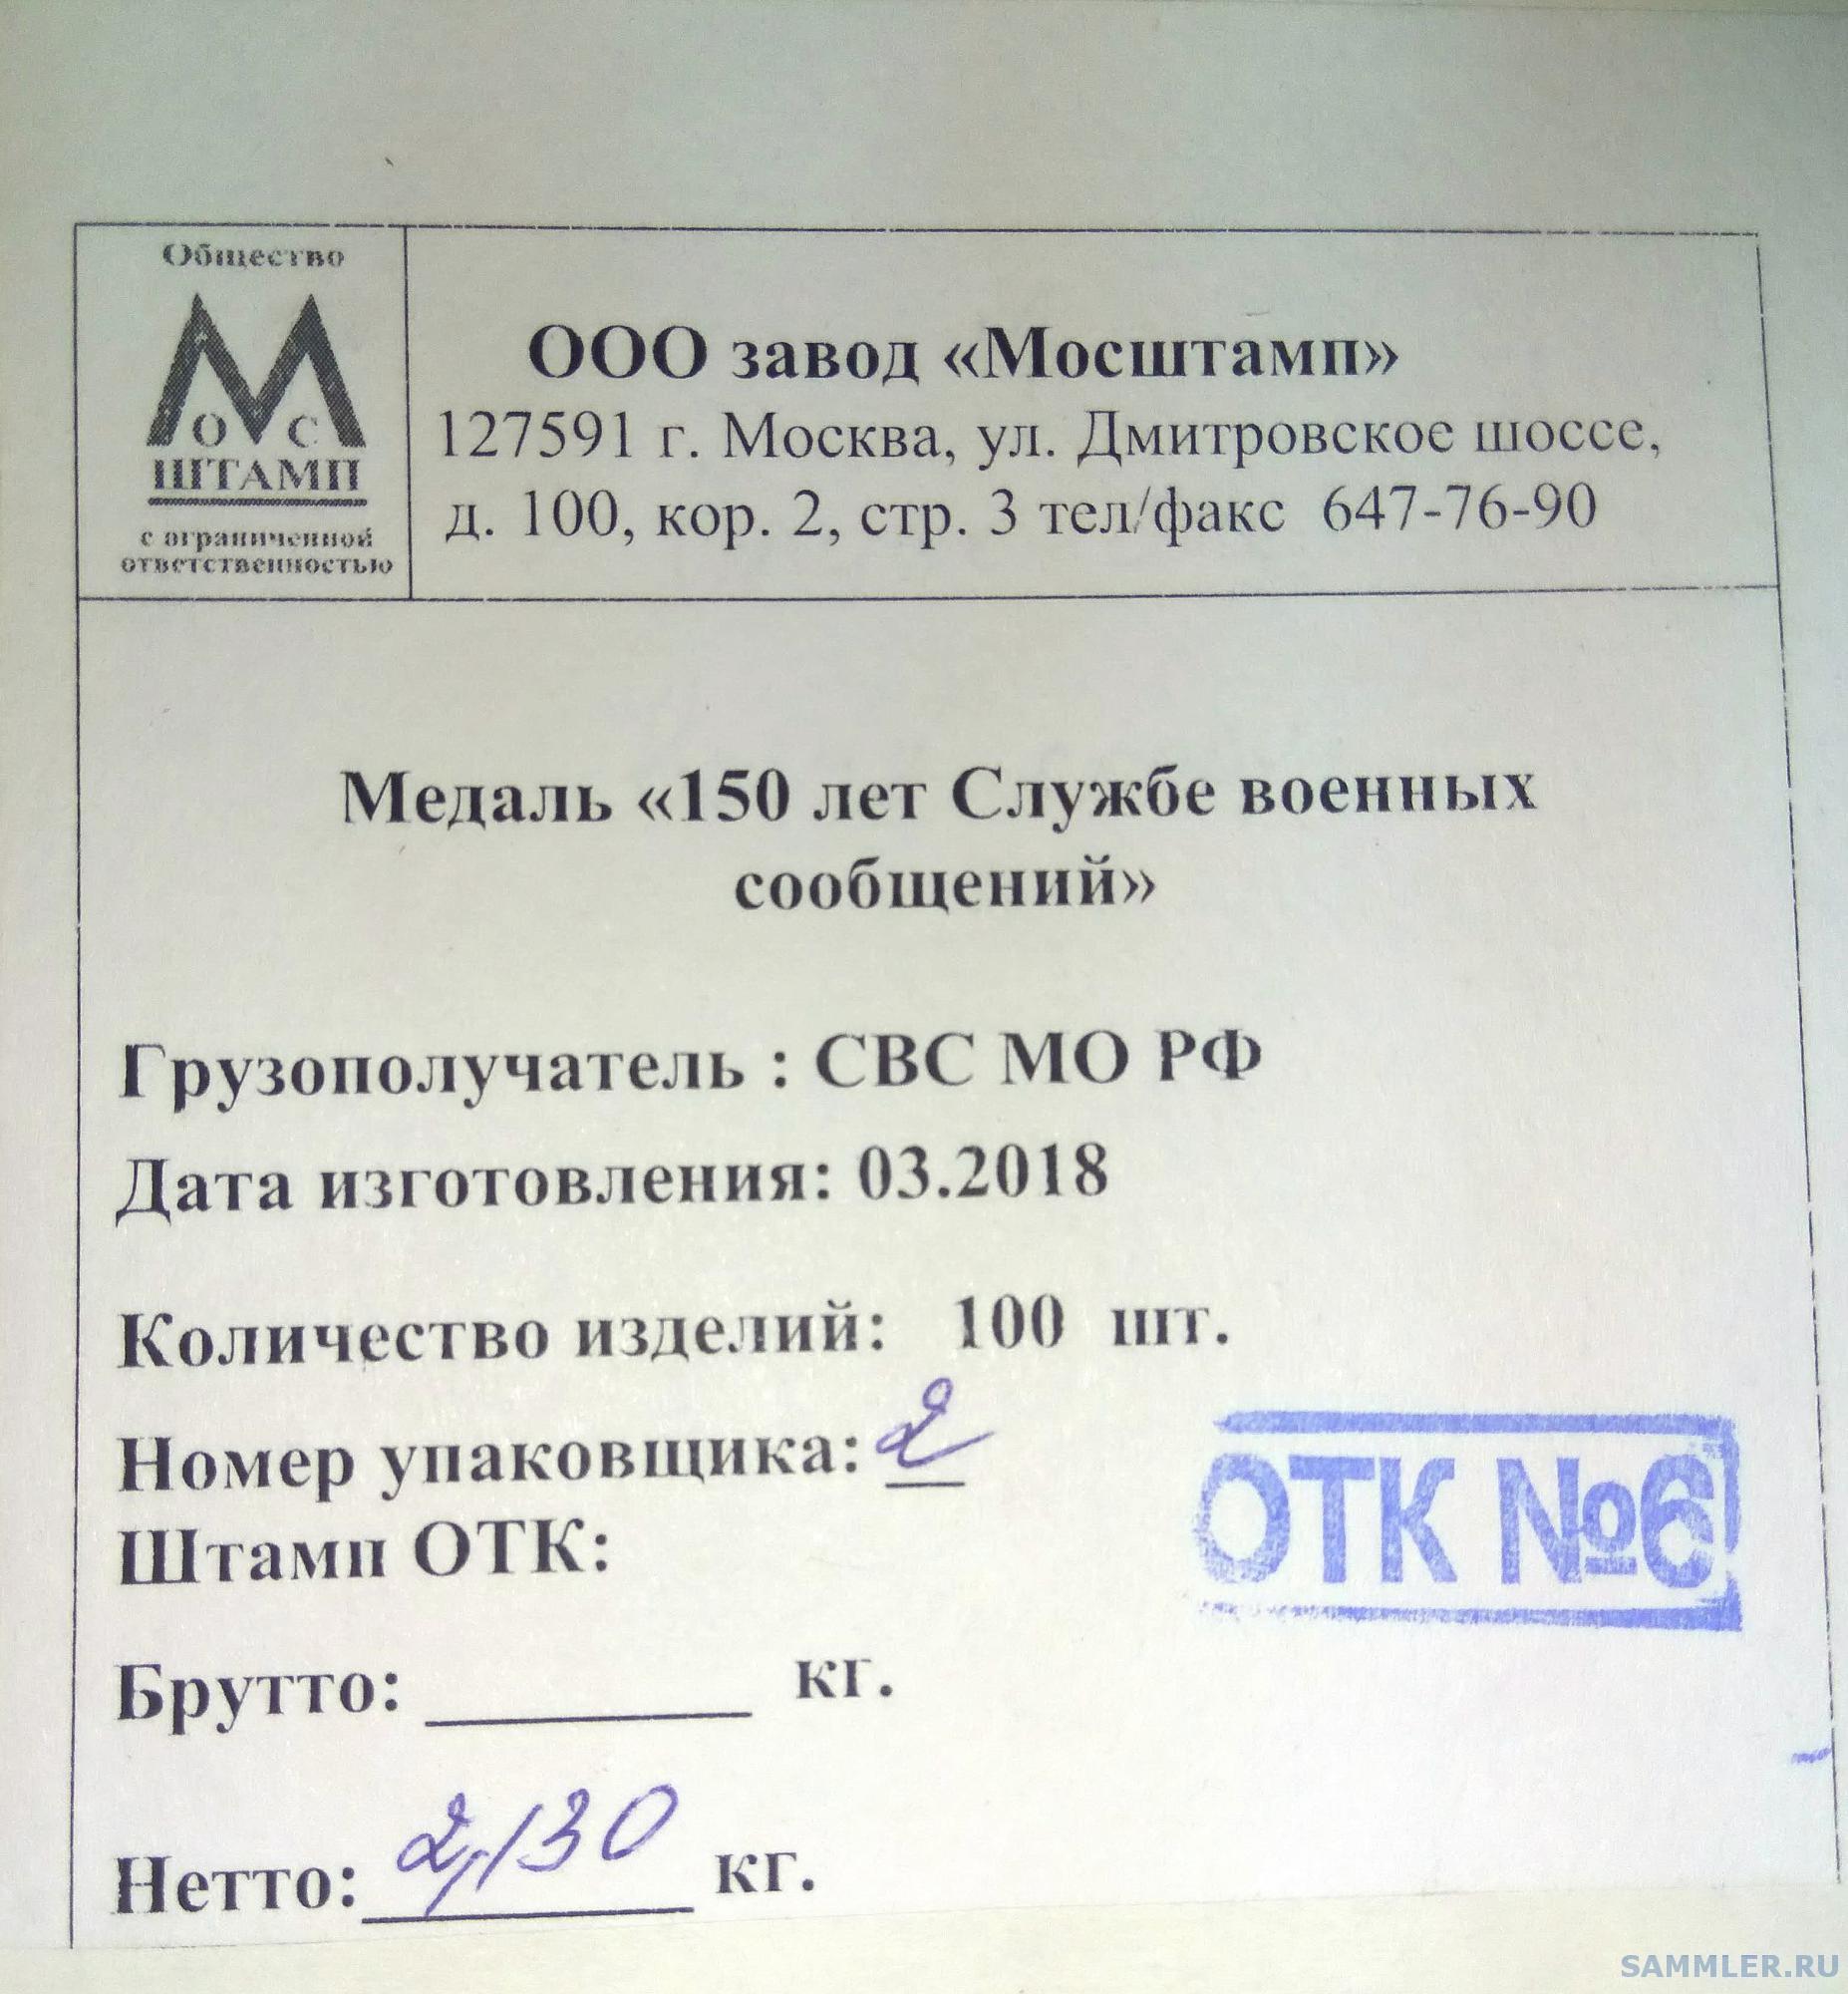 IMG_20180614_103244.jpg